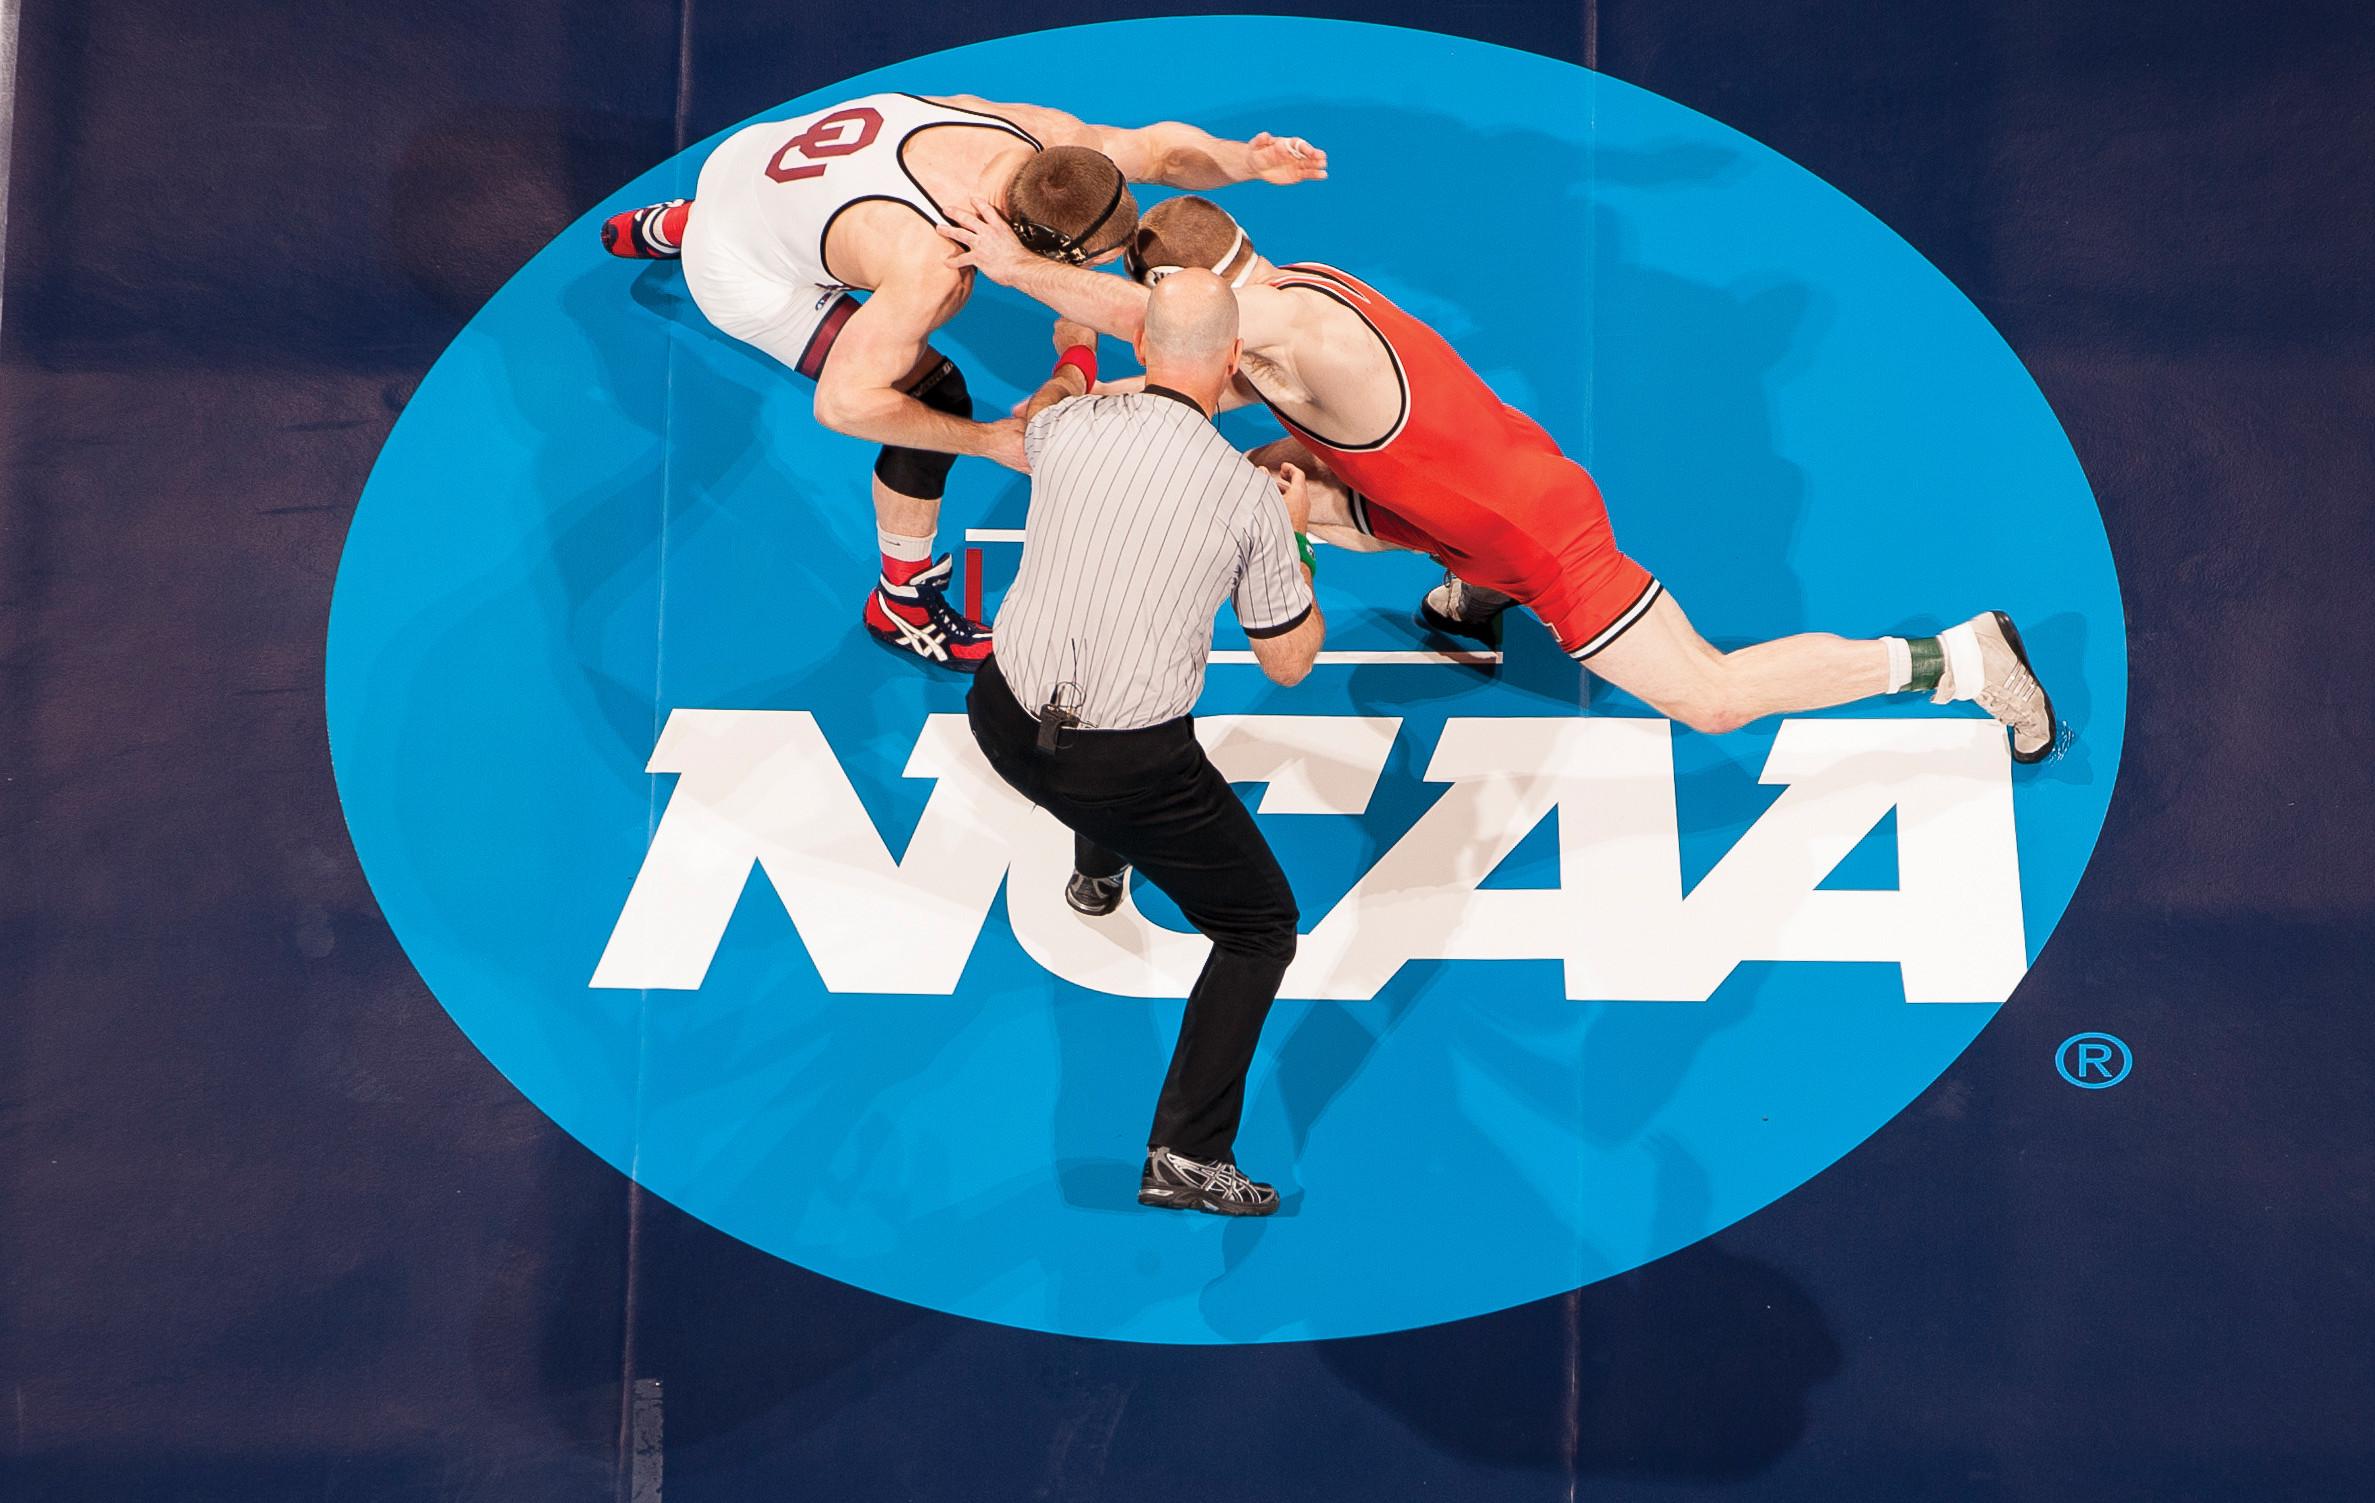 Wrestling Championship